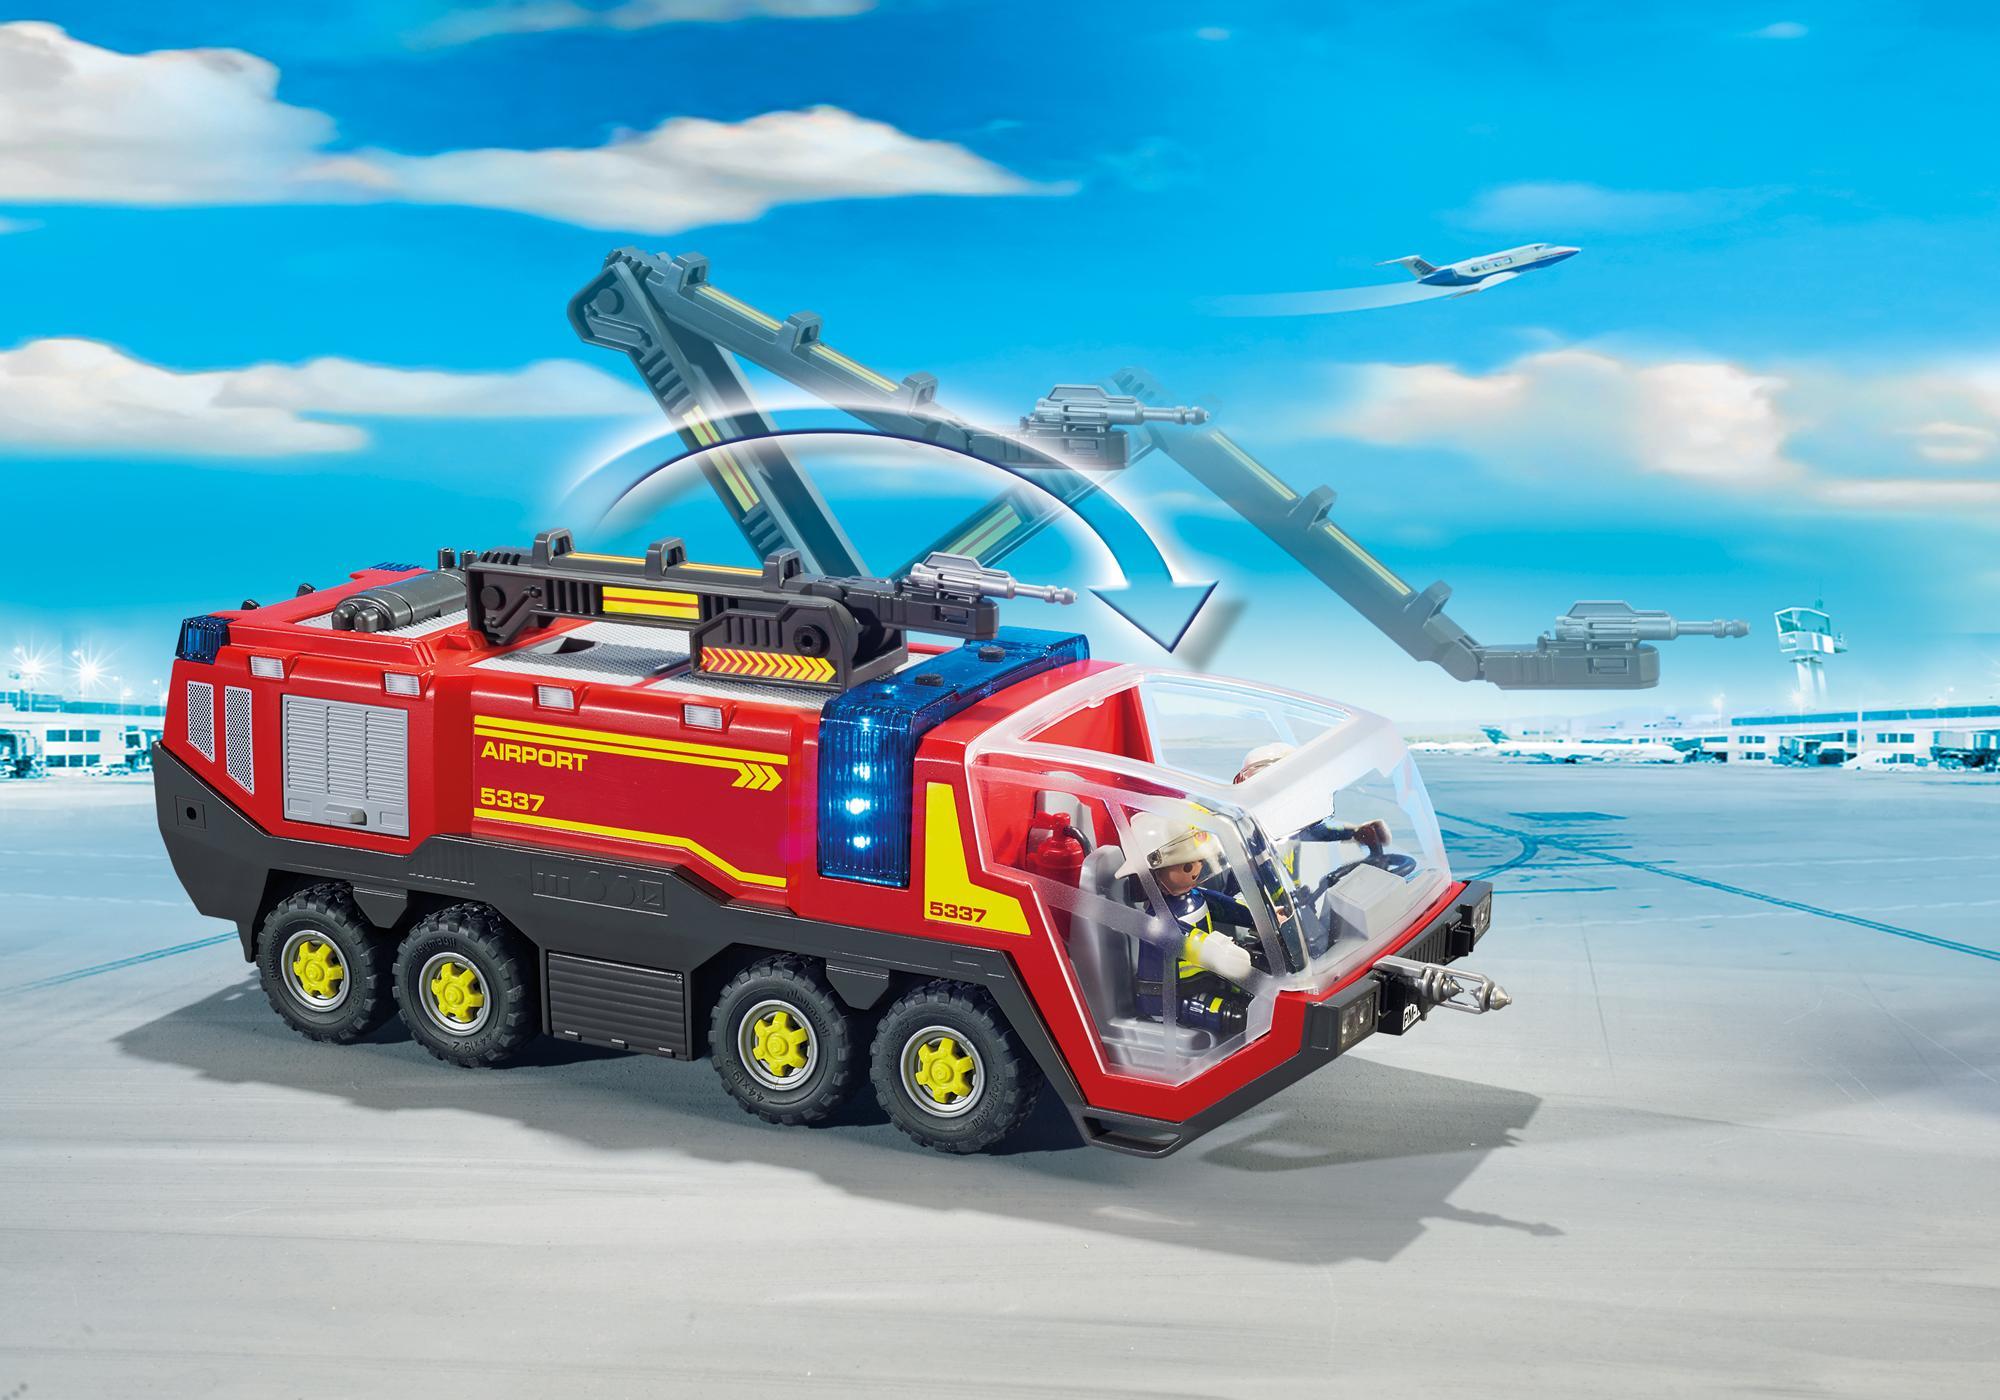 http://media.playmobil.com/i/playmobil/5337_product_extra4/Πυροσβεστικό όχημα αεροδρομίου με φώτα και ήχο